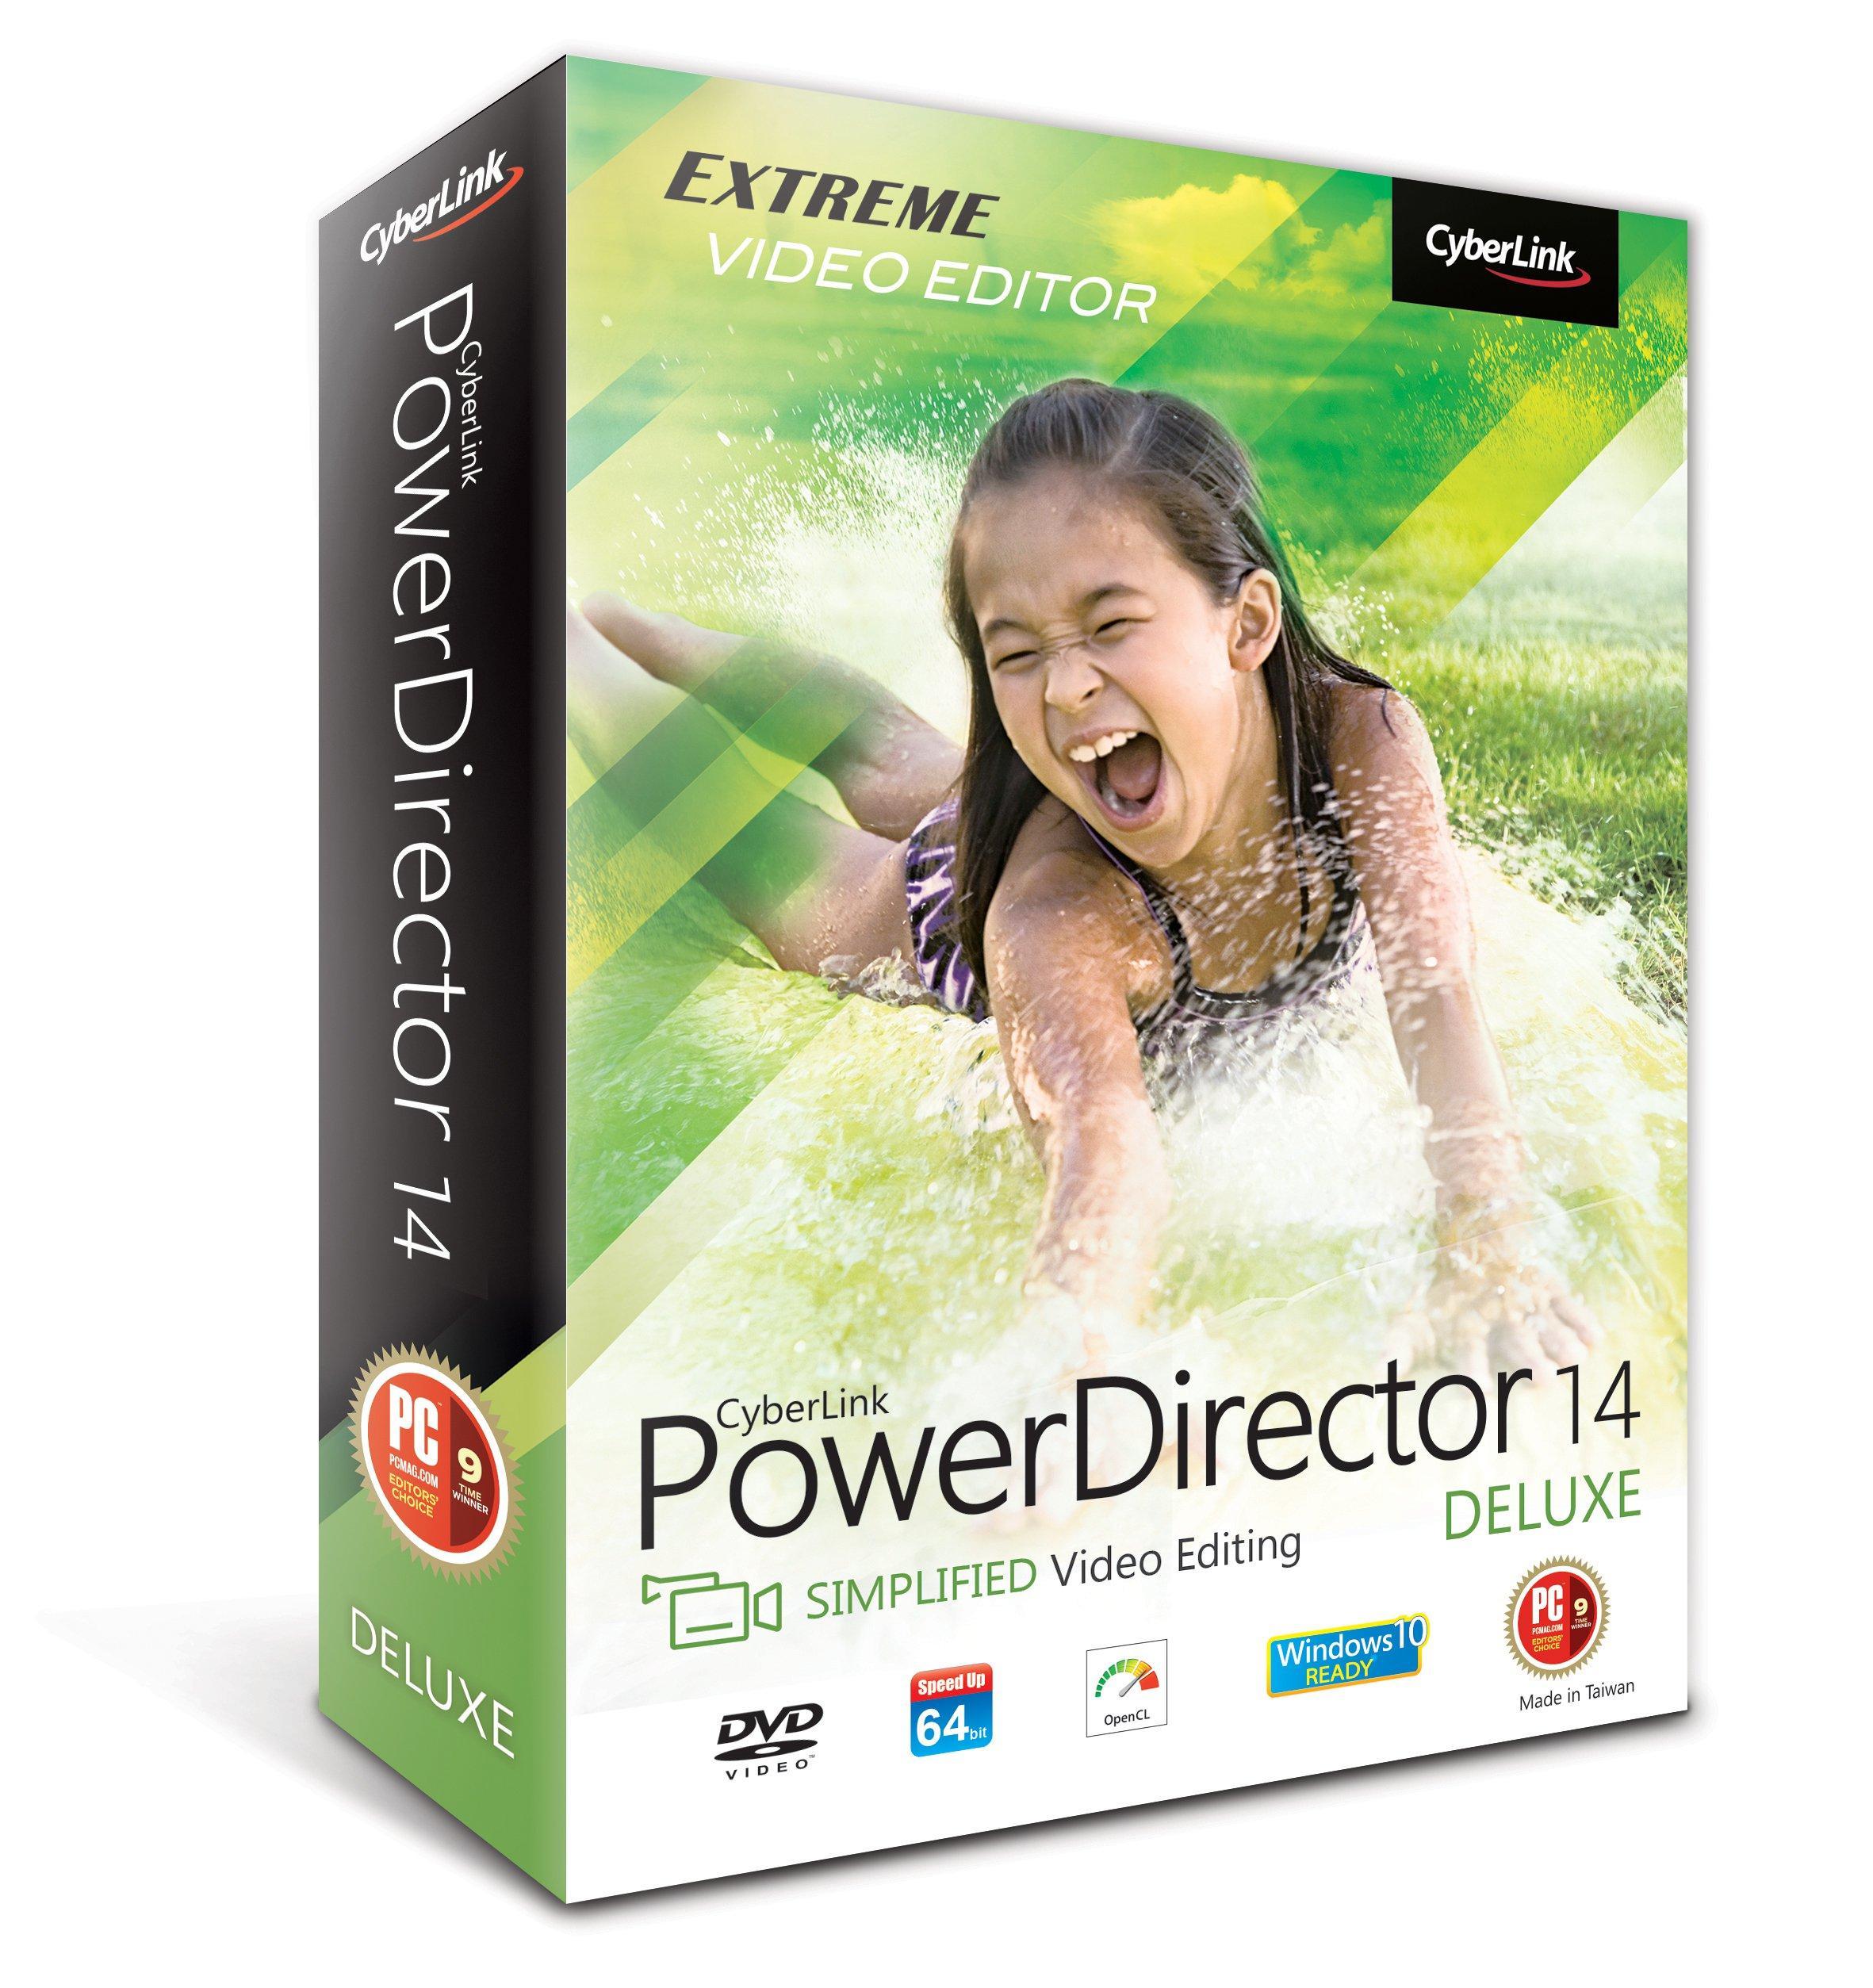 Logiciel CyberLink PowerDirector 14 gratuit sur PC